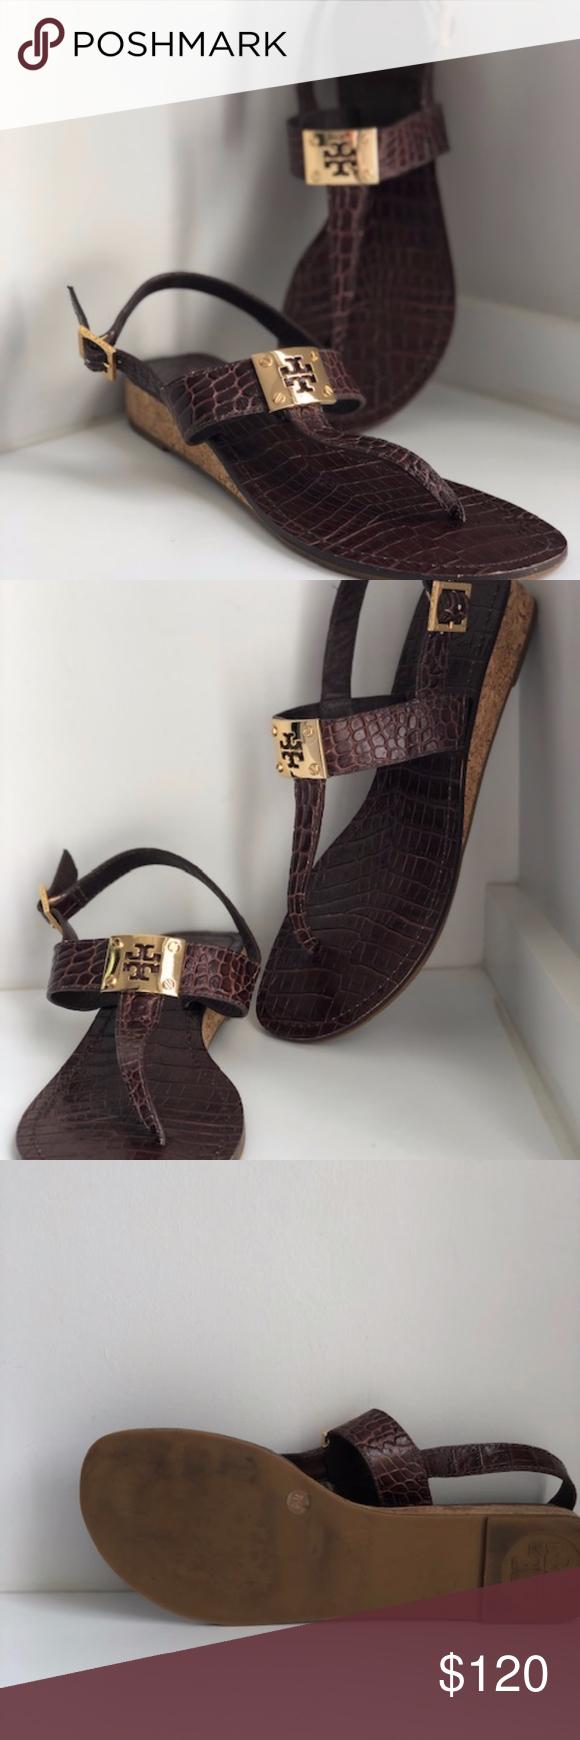 f8de811e1dff82 Tory Burch Leather Croc T-Strap Sandal Authentic Tory Burch brown leather  Croc-embossed